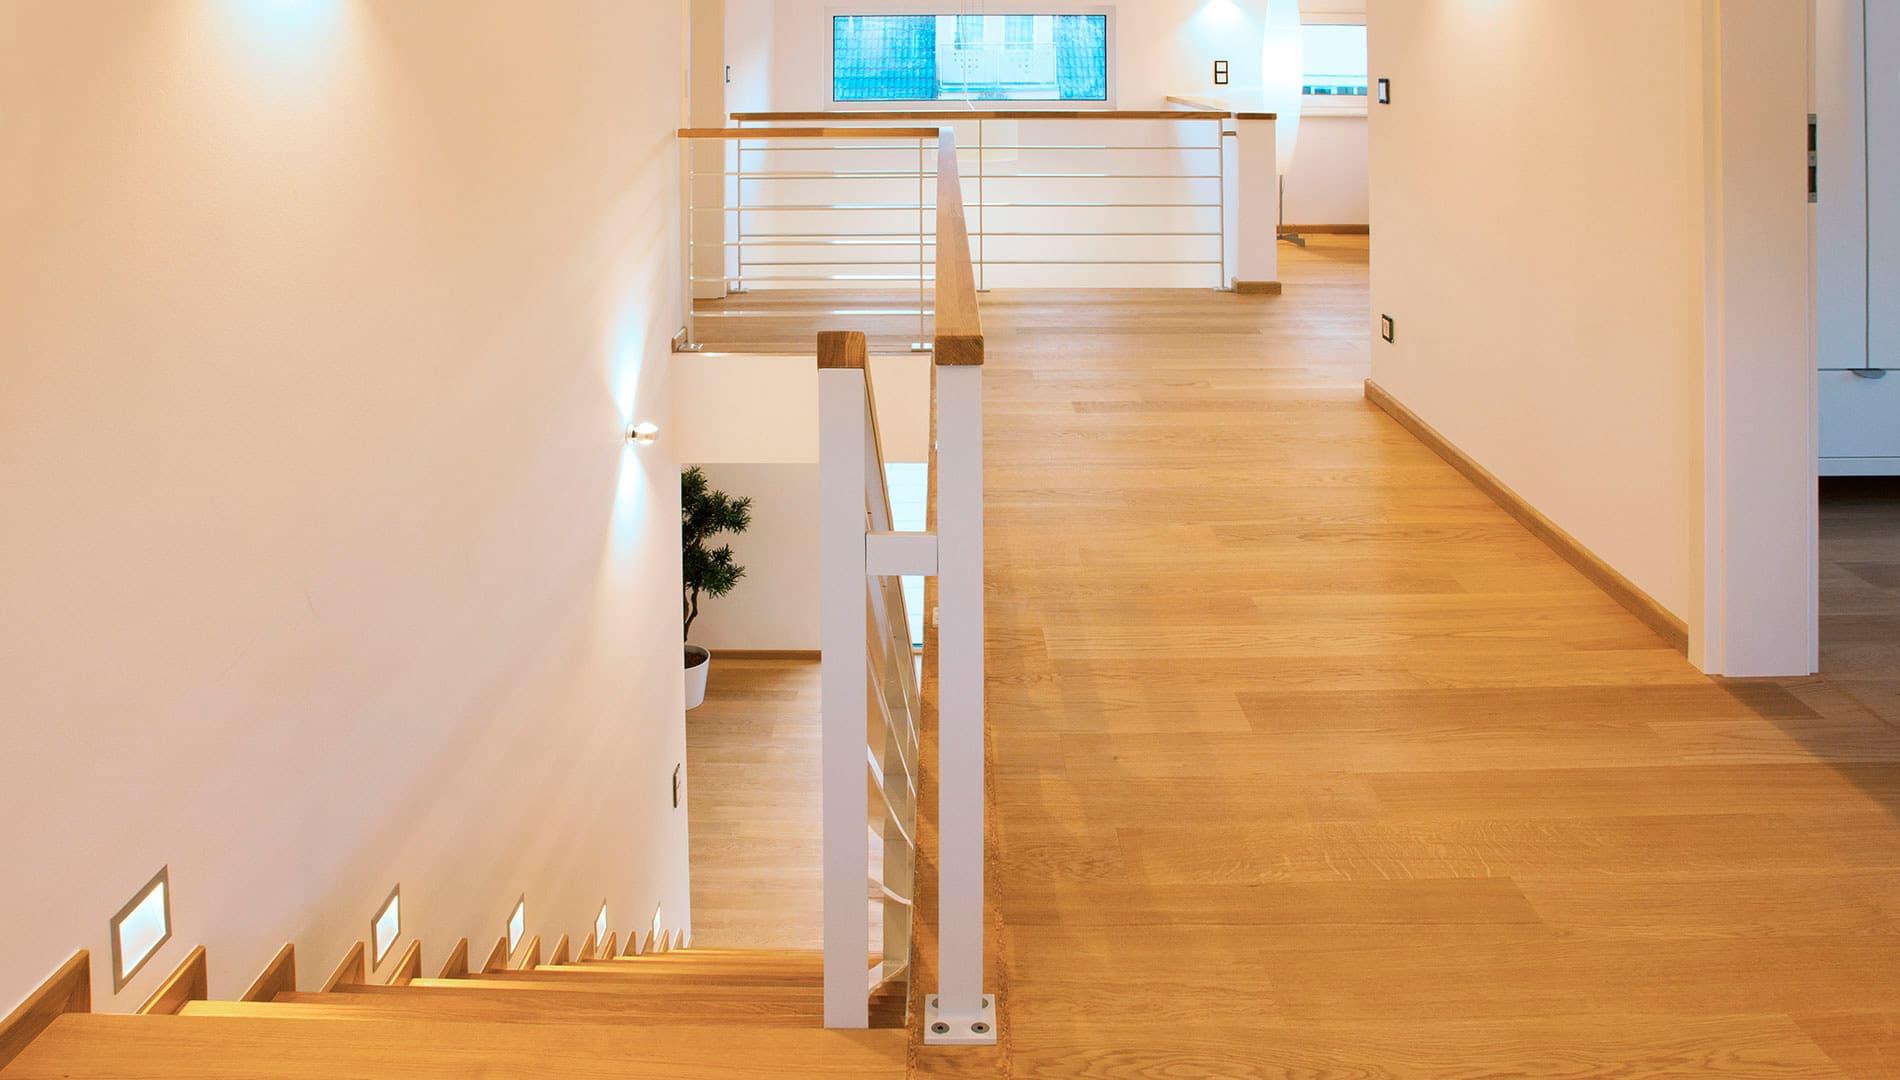 Musterhaus Ulm - Treppe und Galerie